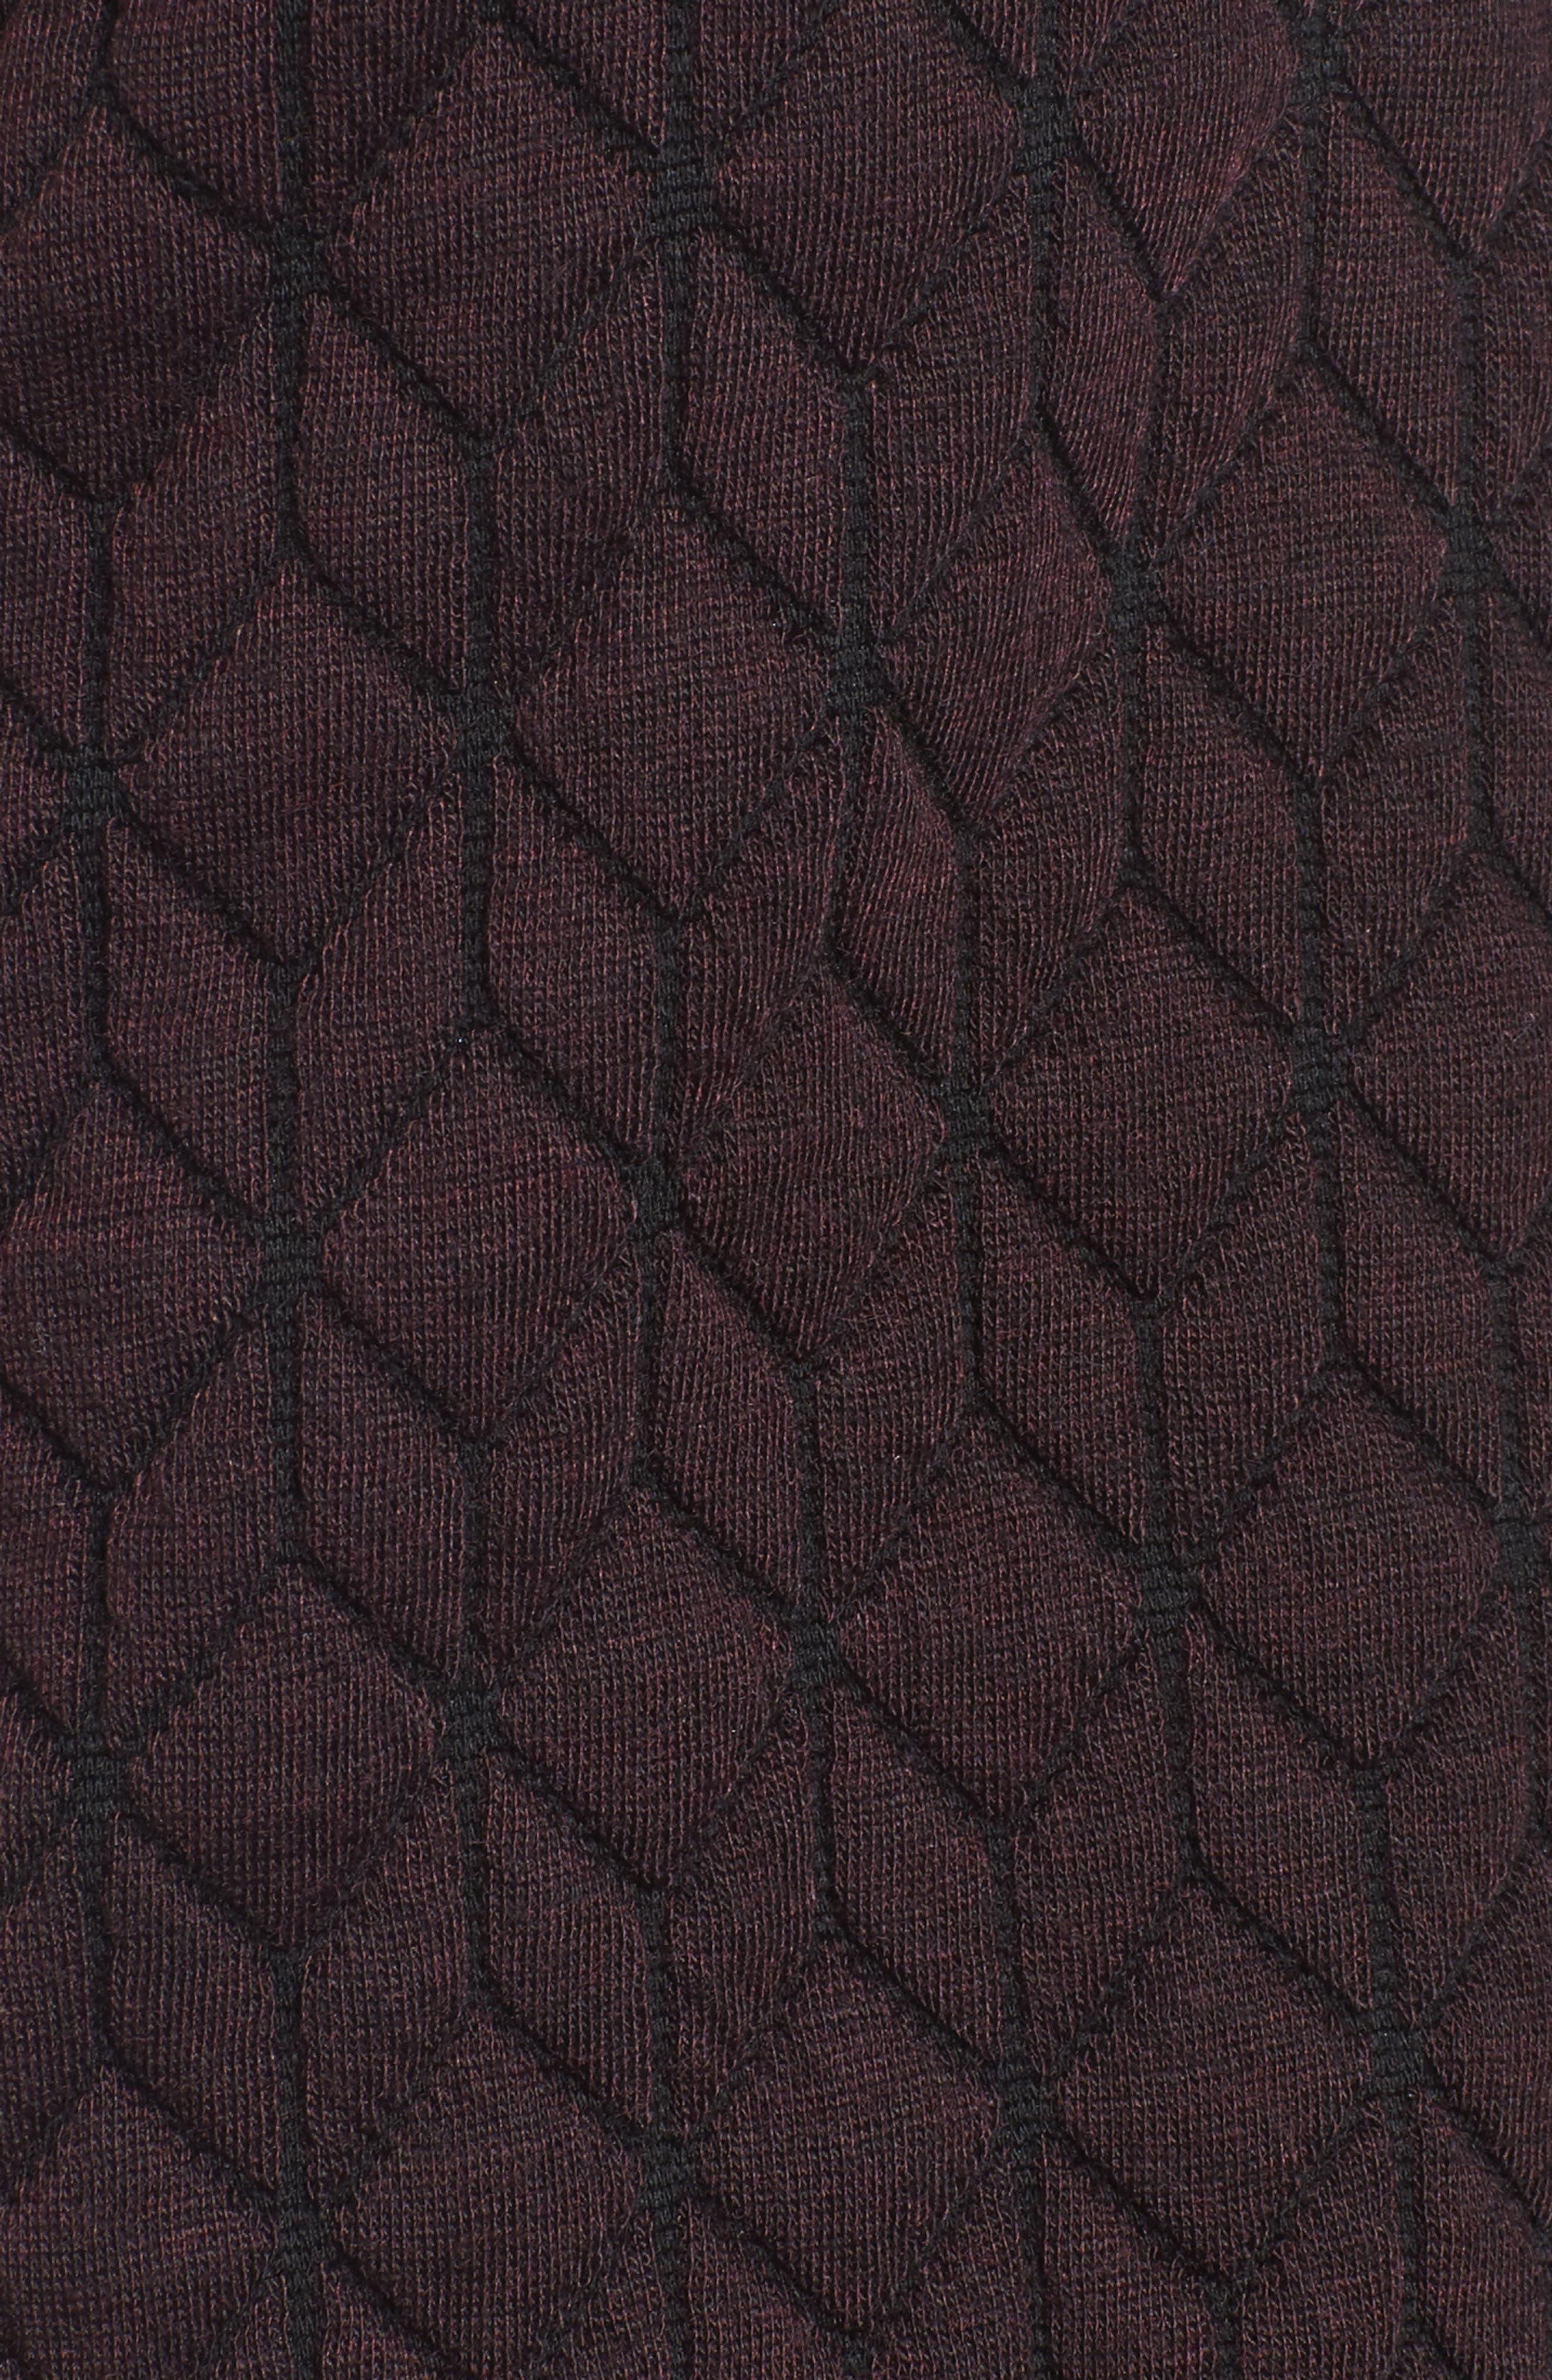 Cozy Knit Coat,                             Alternate thumbnail 5, color,                             Burgundy